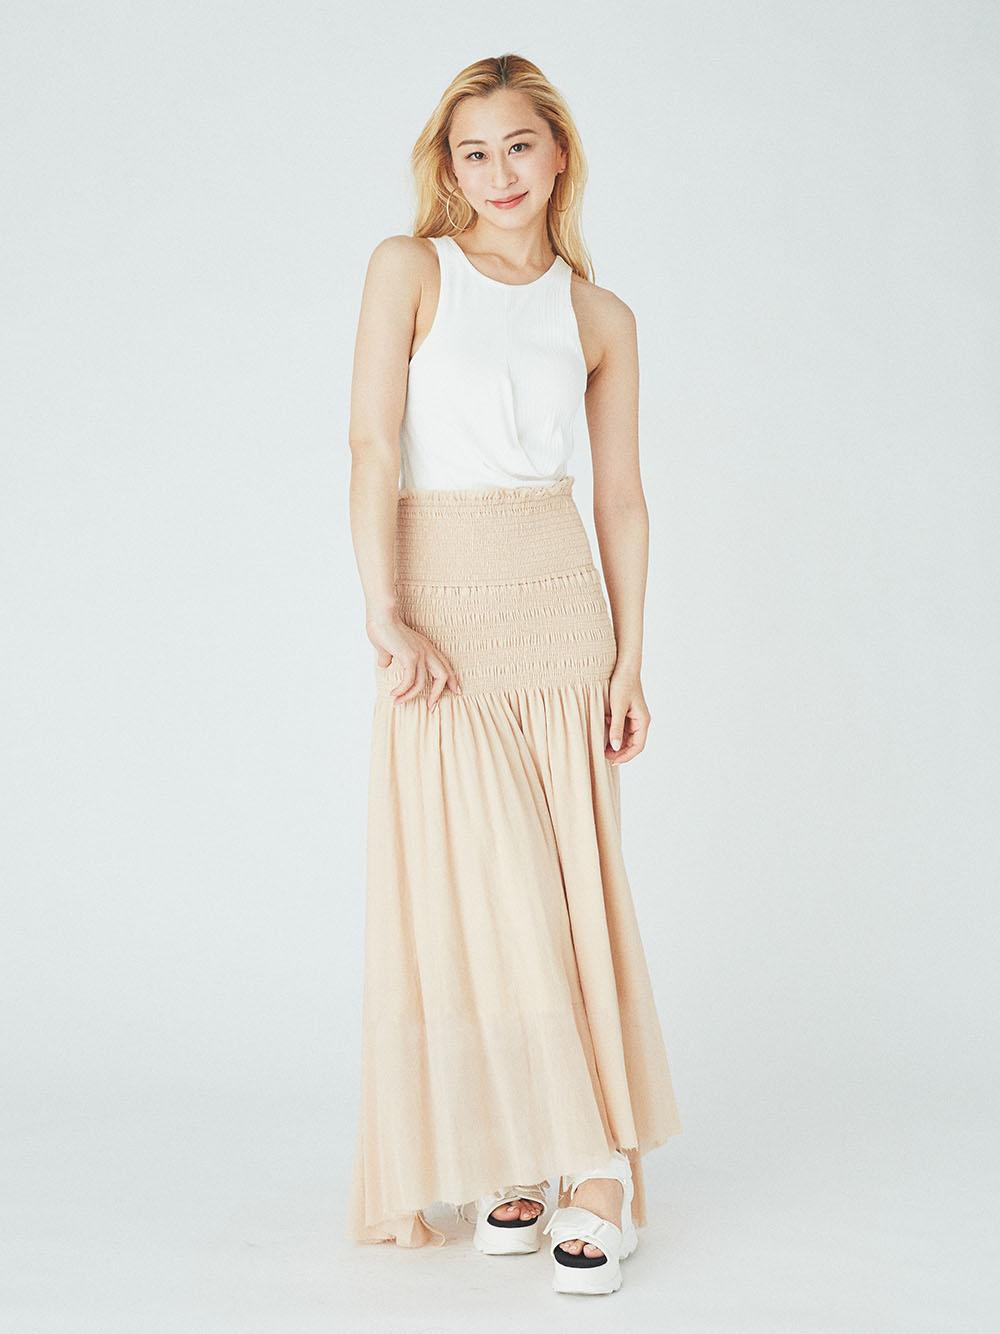 【emmi yoga】Select by aya yoga 2Way シャーリングスカート